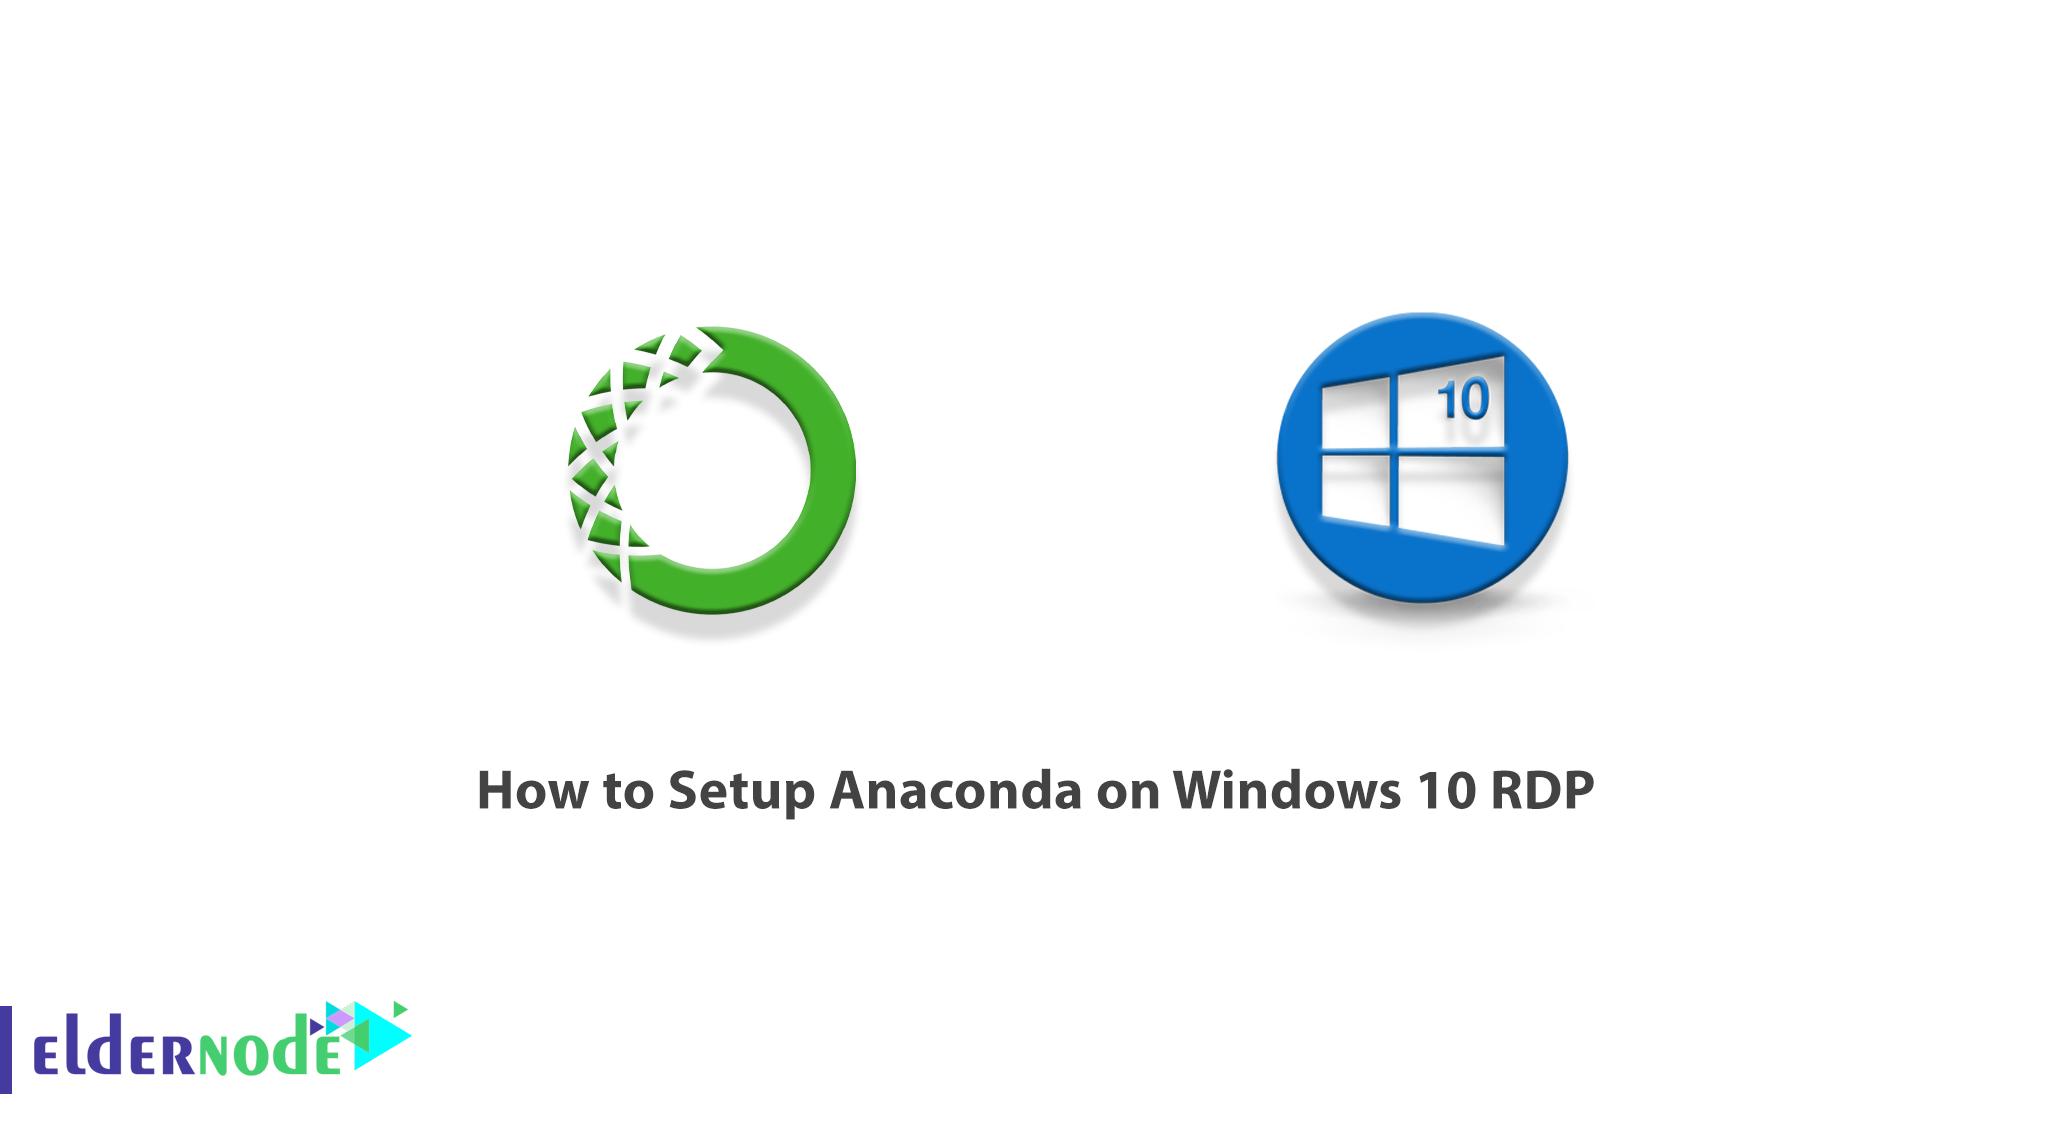 How to Setup Anaconda on Windows 10 RDP